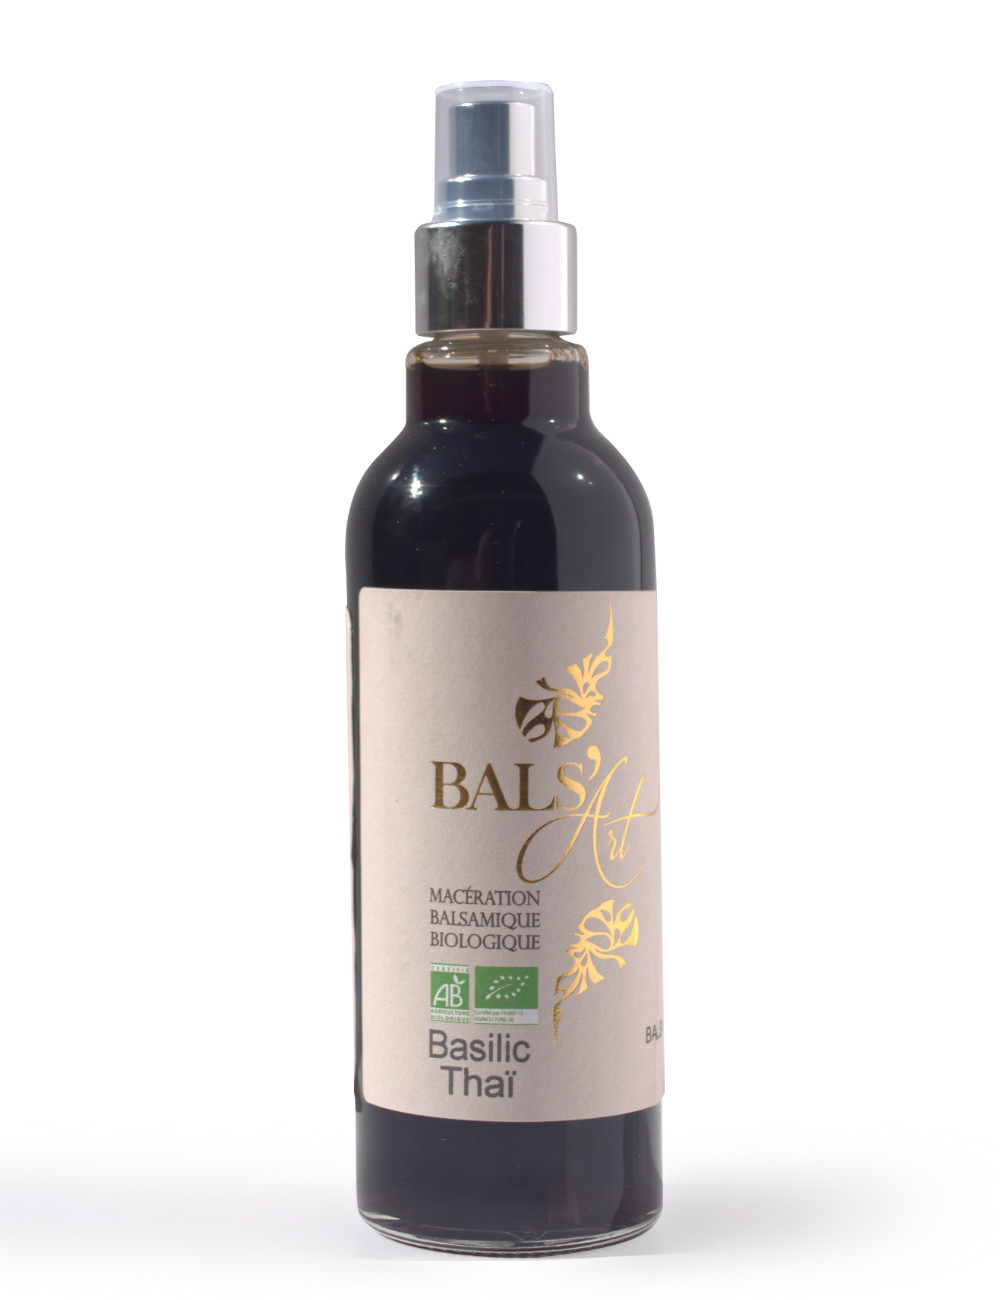 maceration-balsamique-basilic-thai